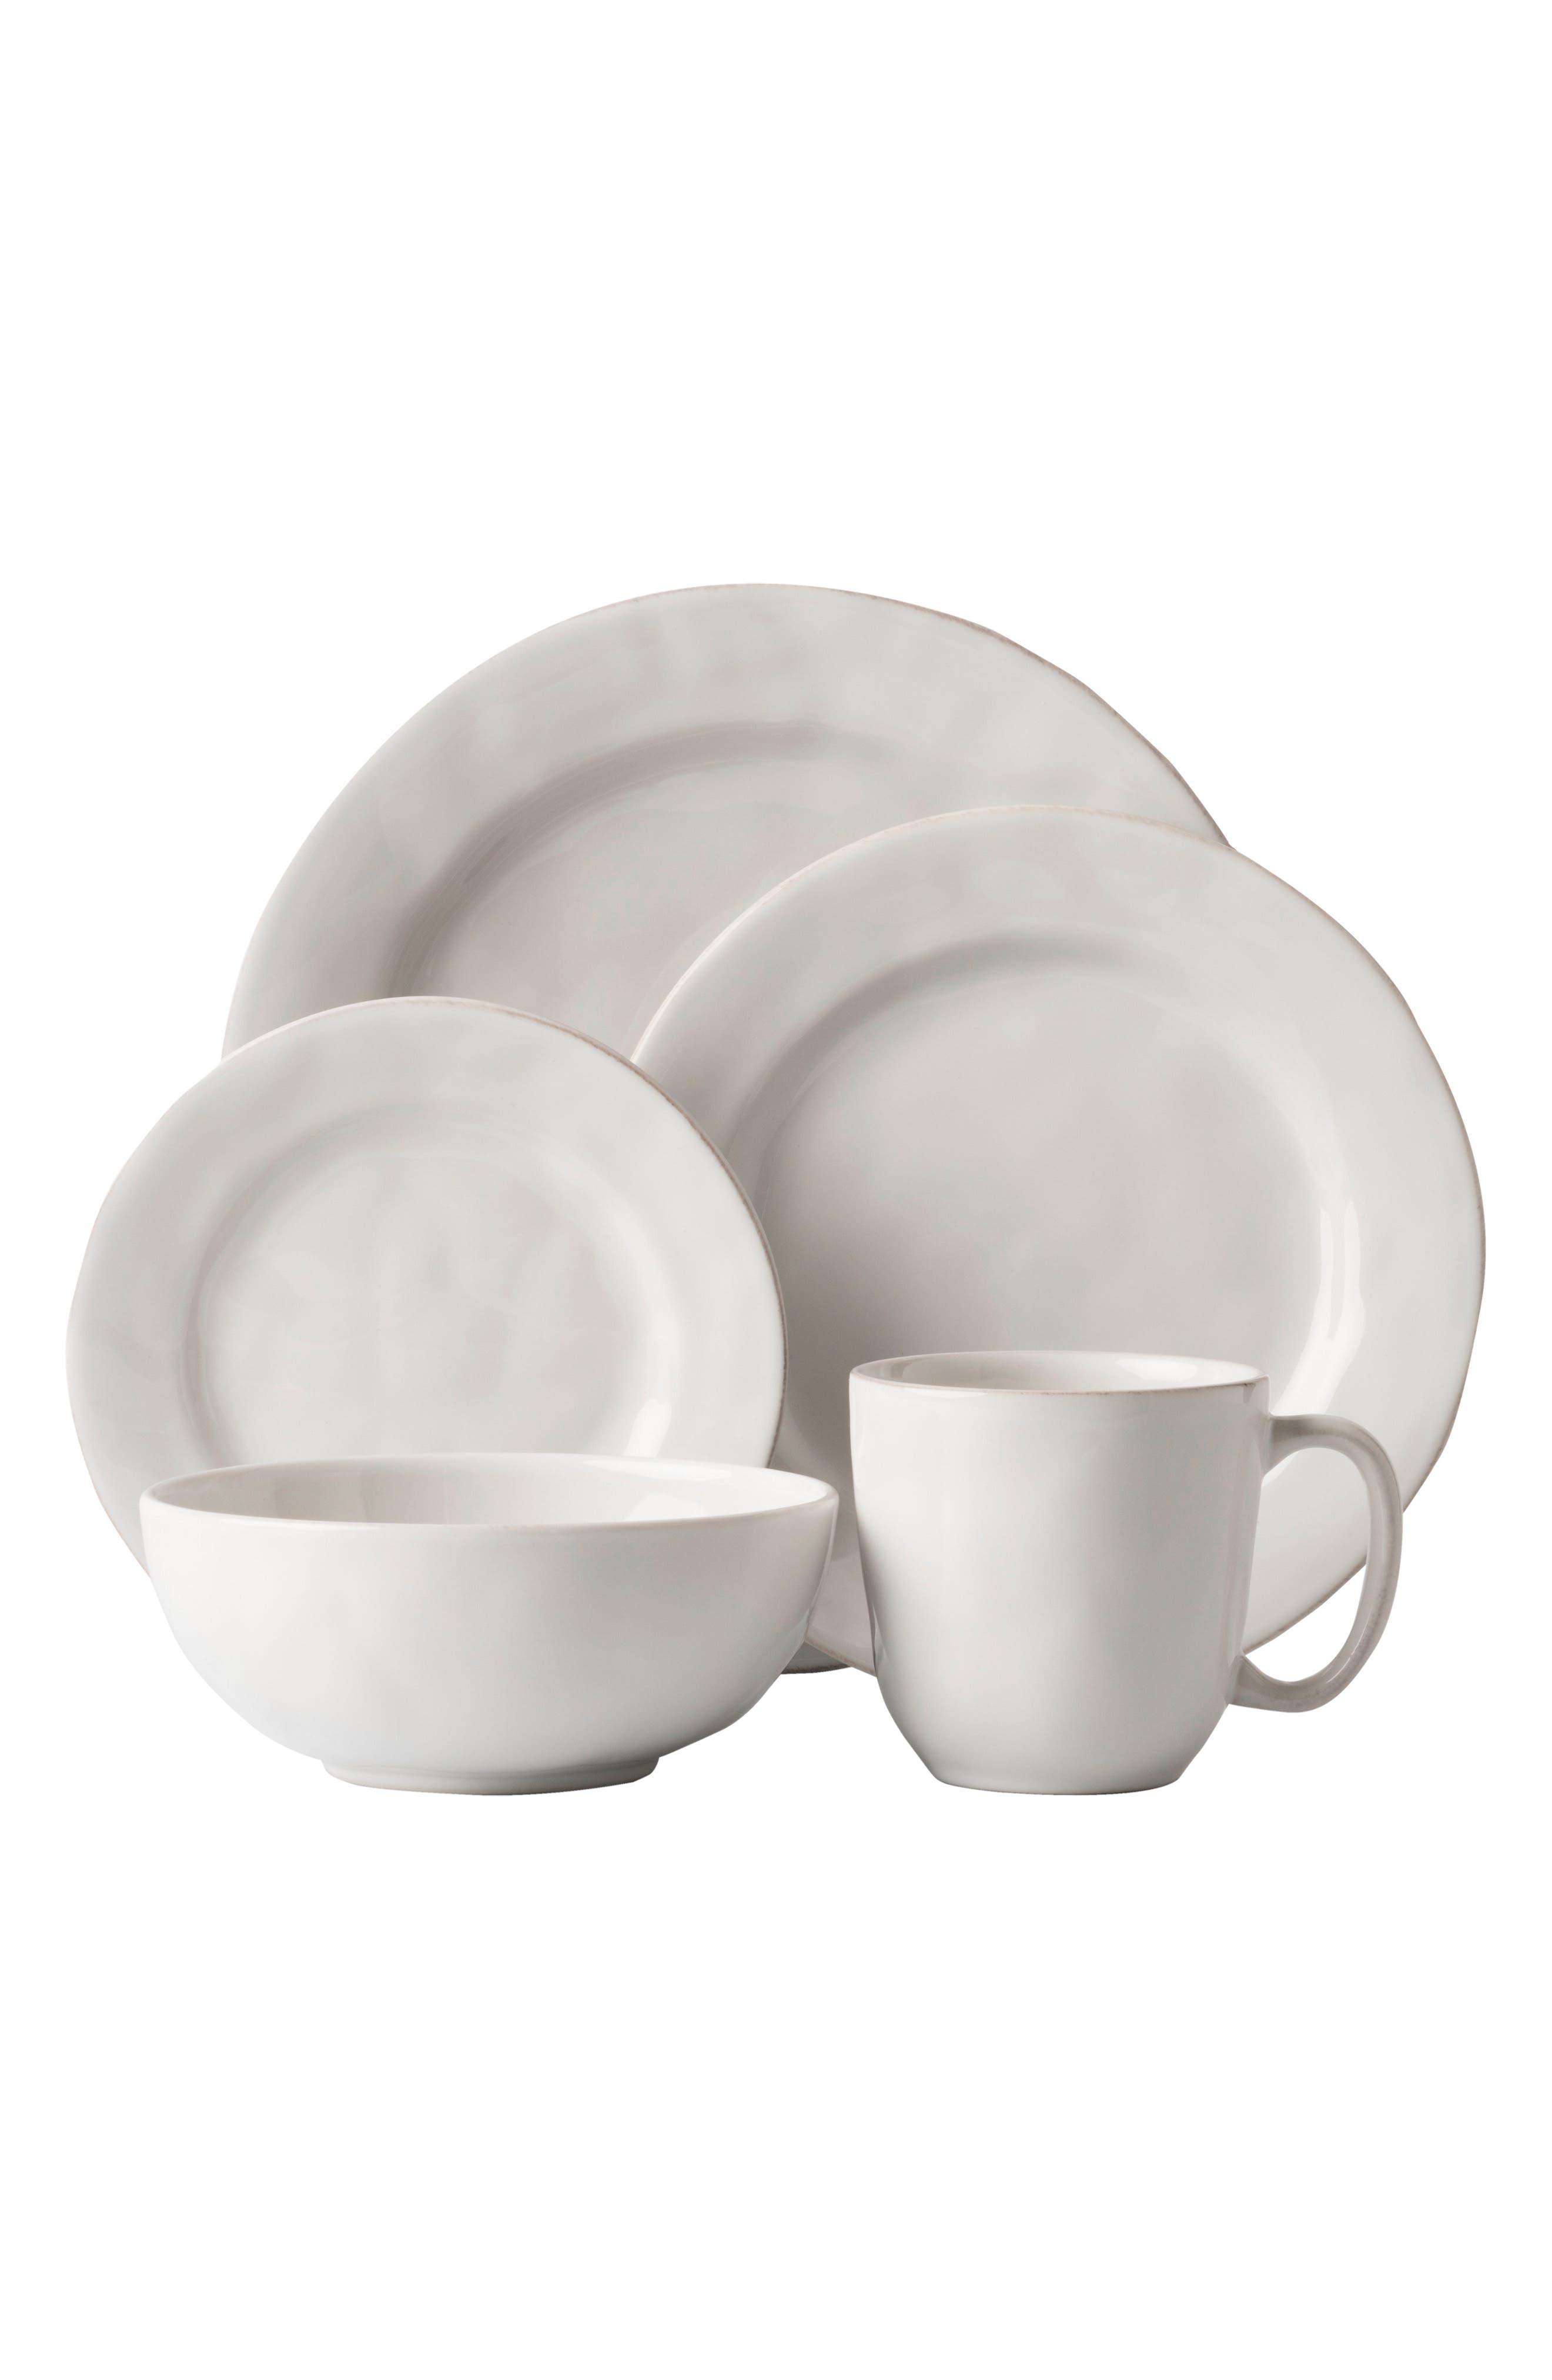 'Puro' 5-Piece Dinnerware Place Setting,                             Alternate thumbnail 2, color,                             WHITE